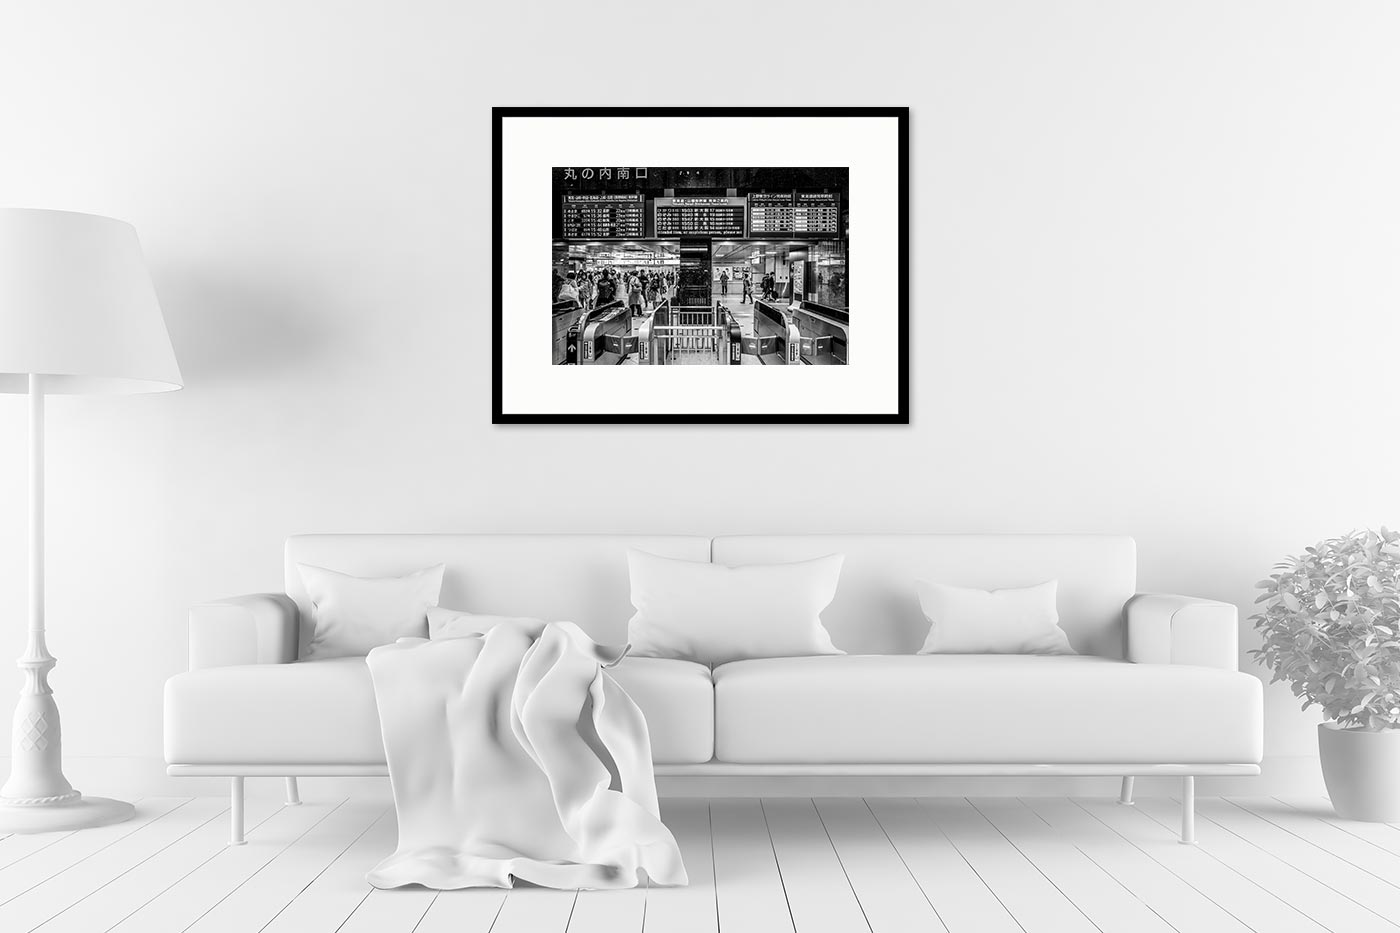 Cadre galerie 60x80 Tokyo Station